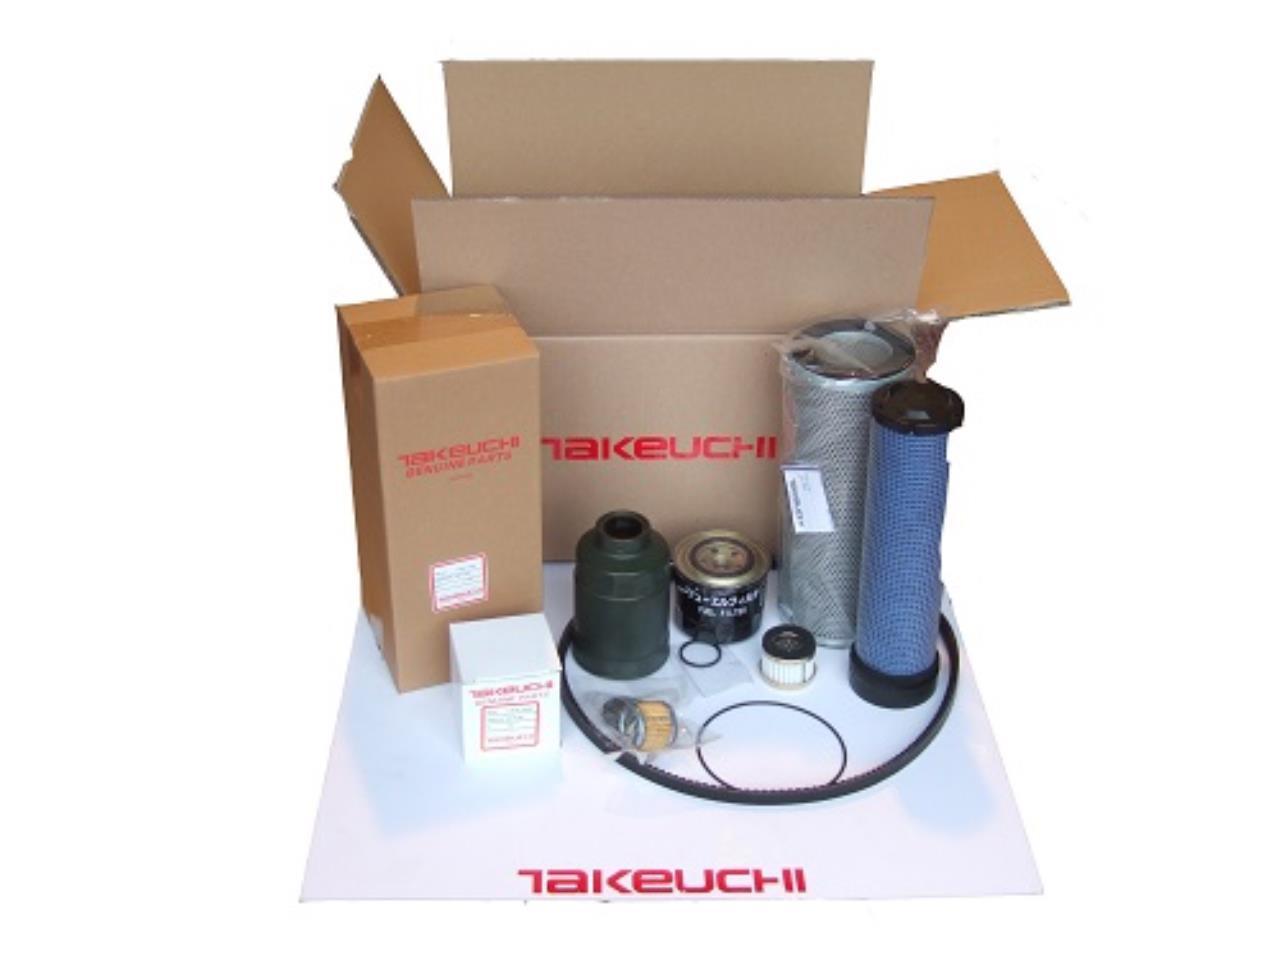 Takeuchi TB2150 filtersæt